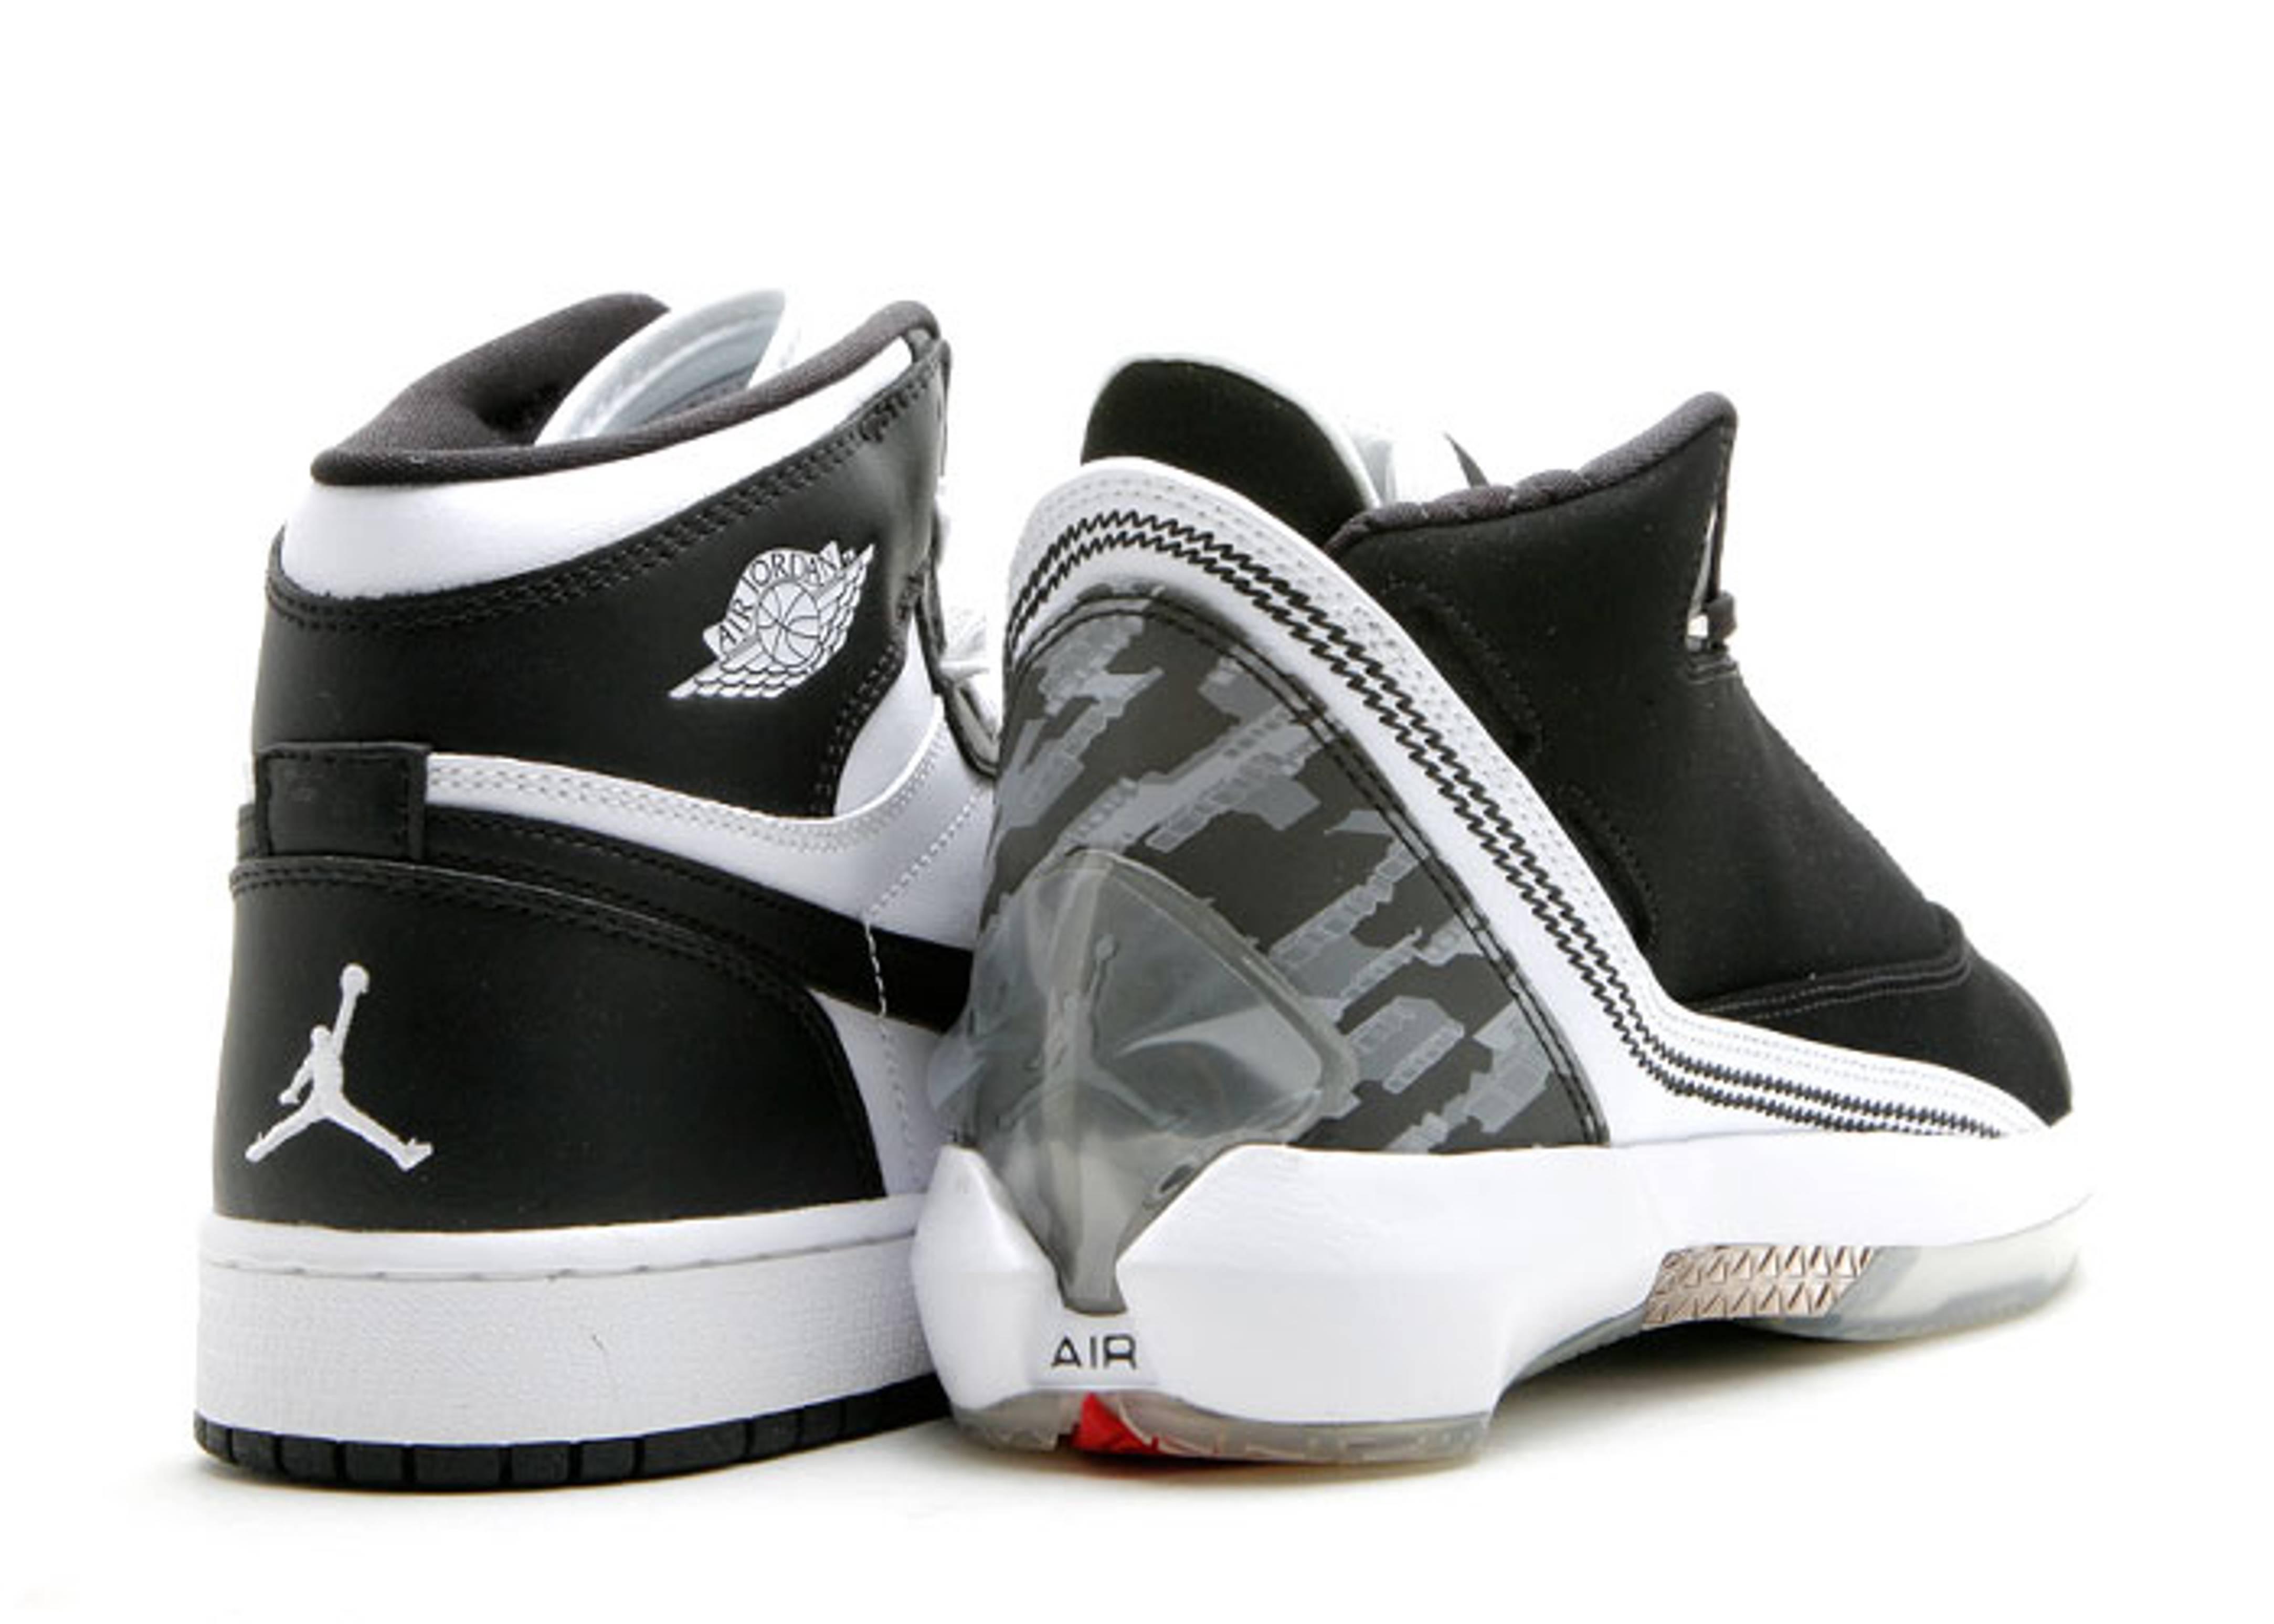 c88919c73bb7 Air Jordan 22 (XXII) Shoes - Nike